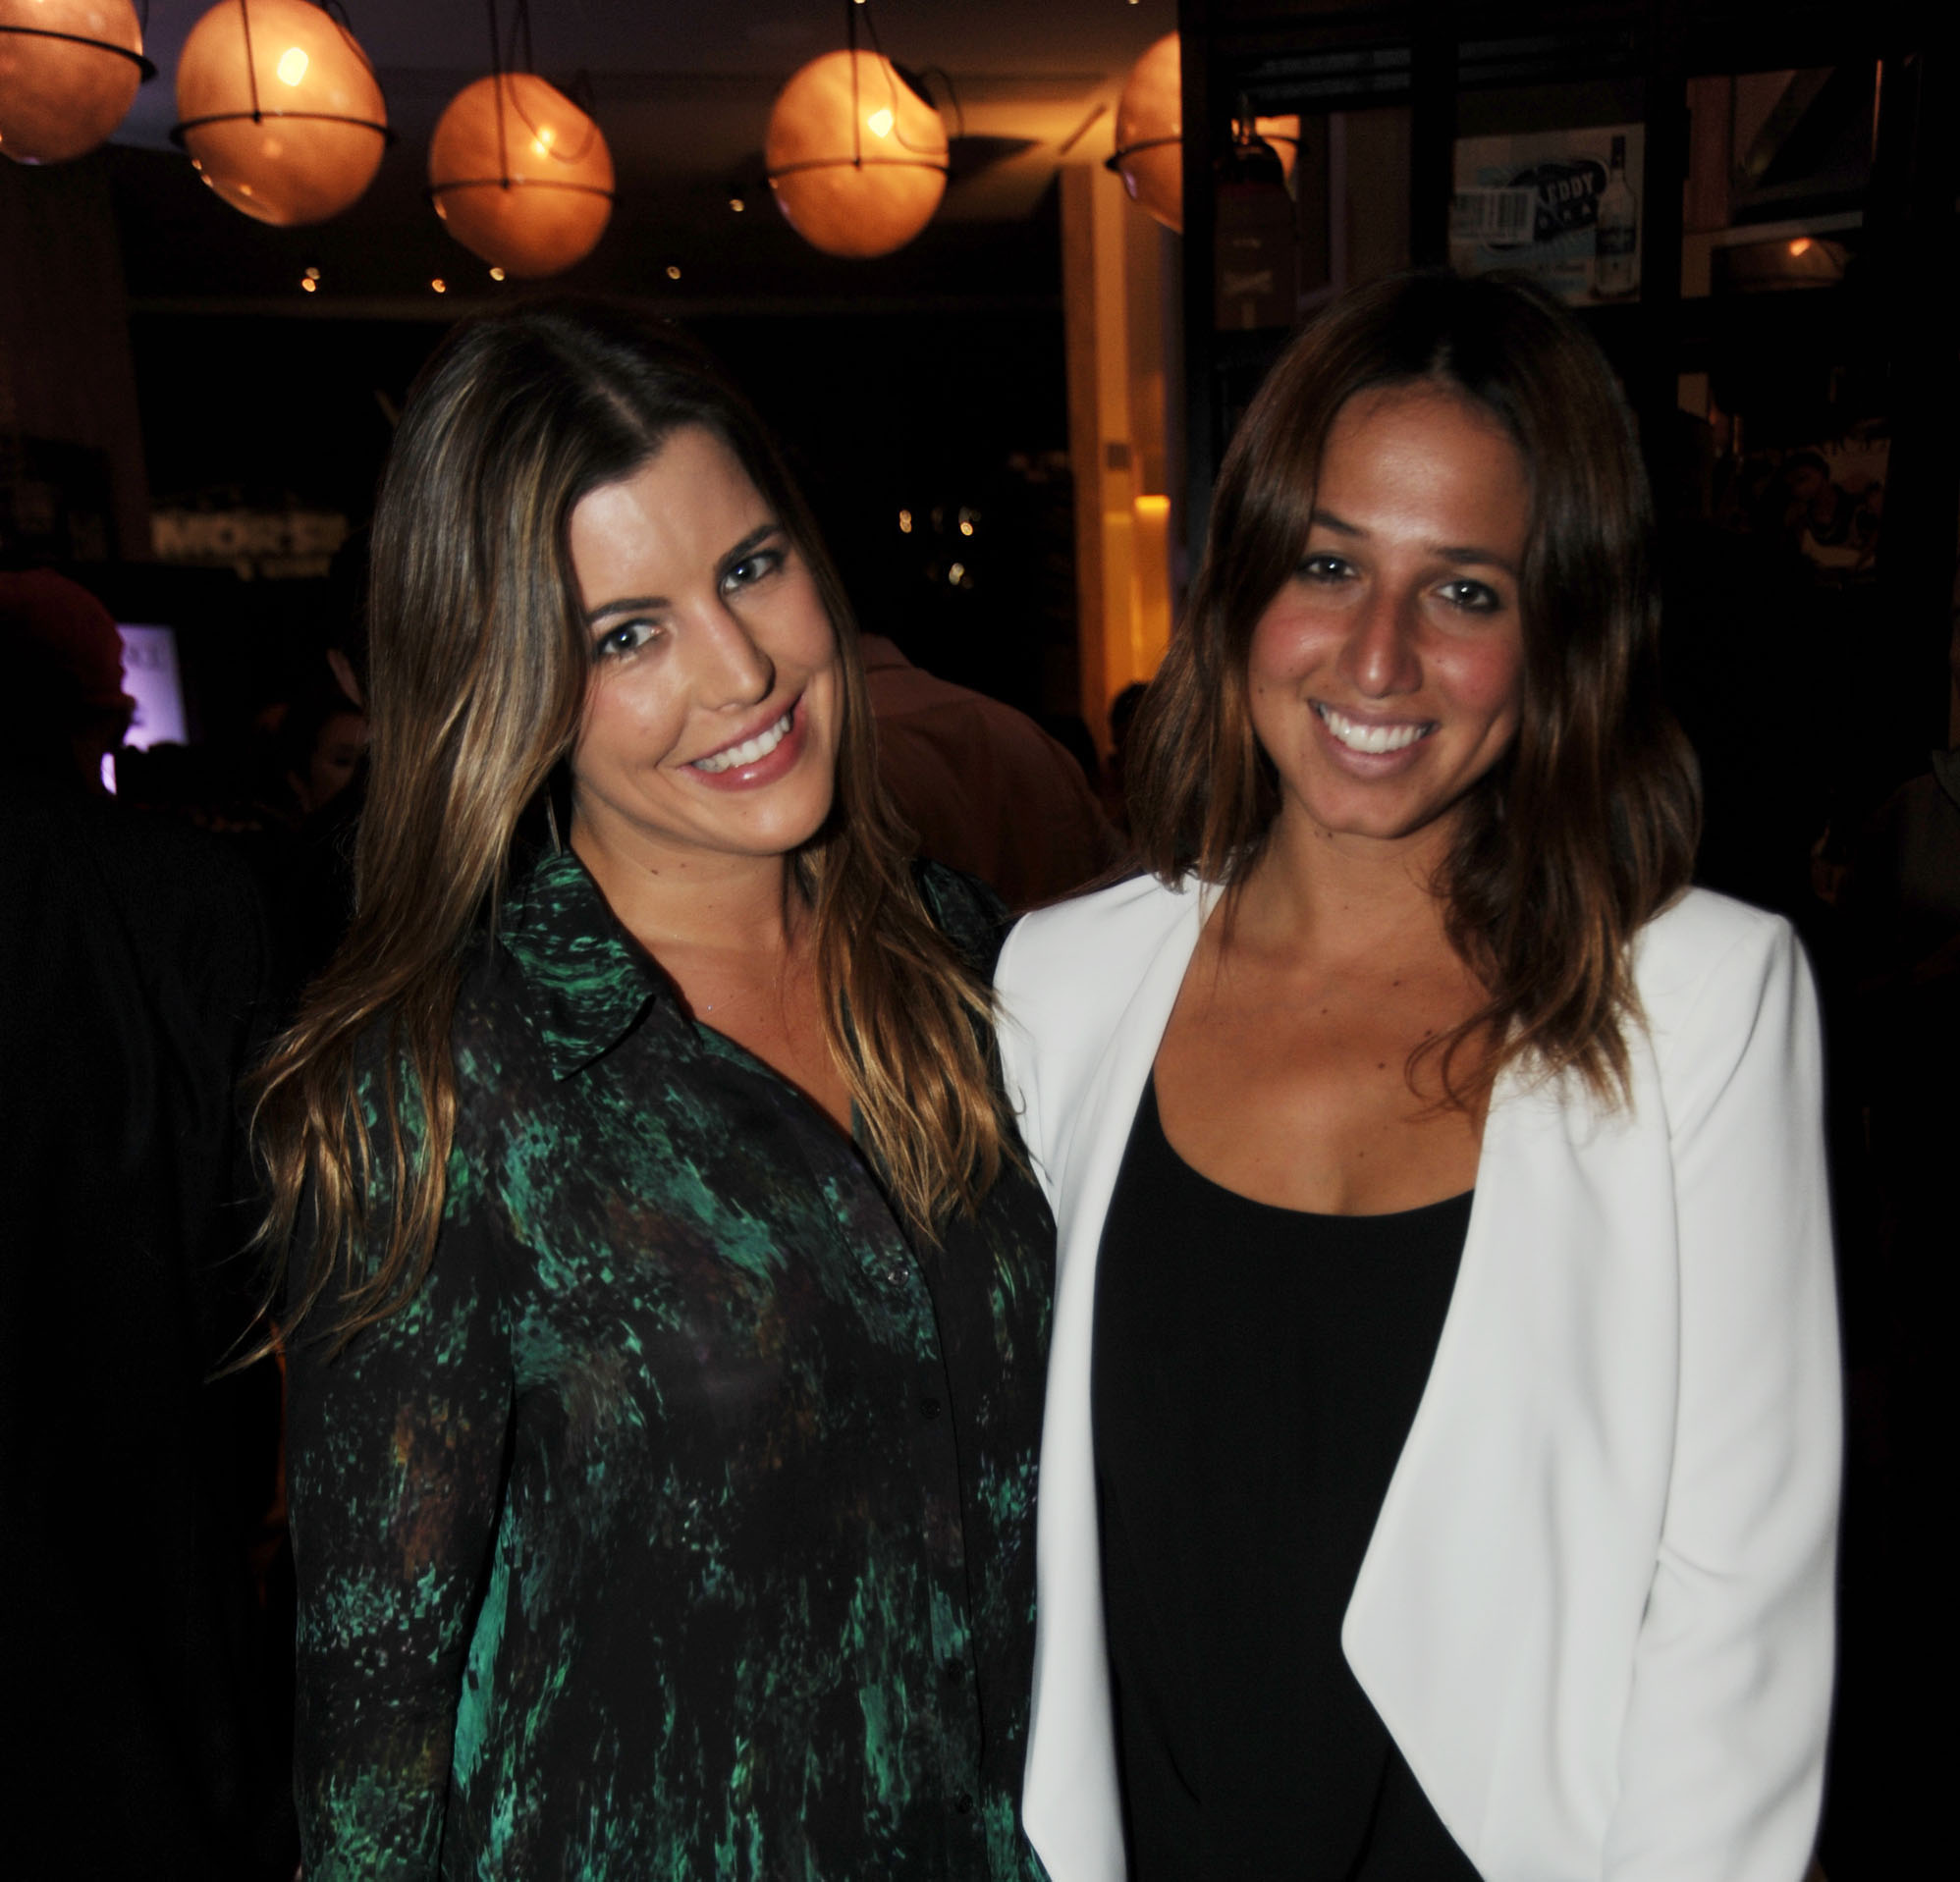 Xenia-Deli-Venice-Magazine-cover-party-burlock-coast-Henia-Gringarten-Amy-Fleischman